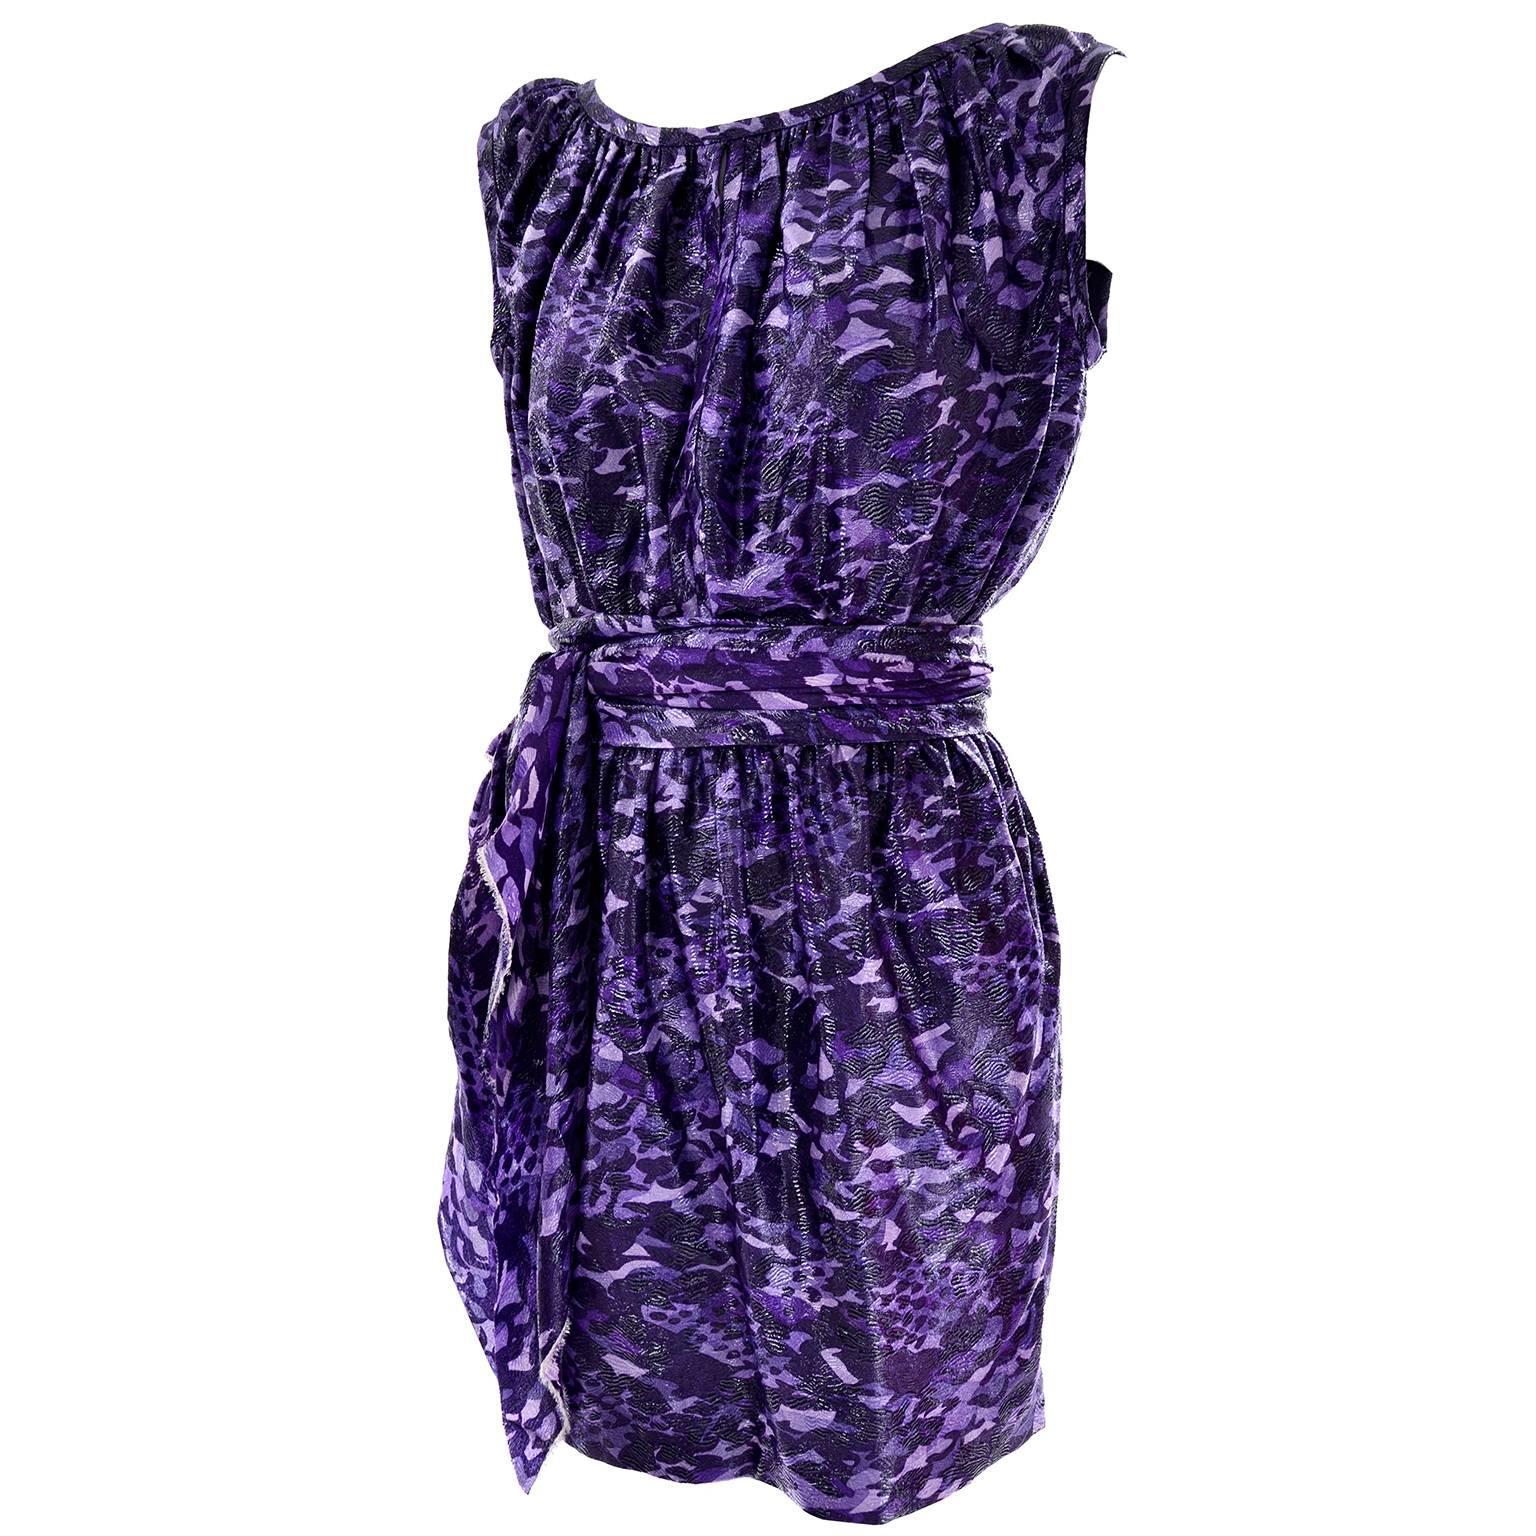 Marc Jacobs Dress in a Purple and Black Metallic Leopard Print Silk Size 4